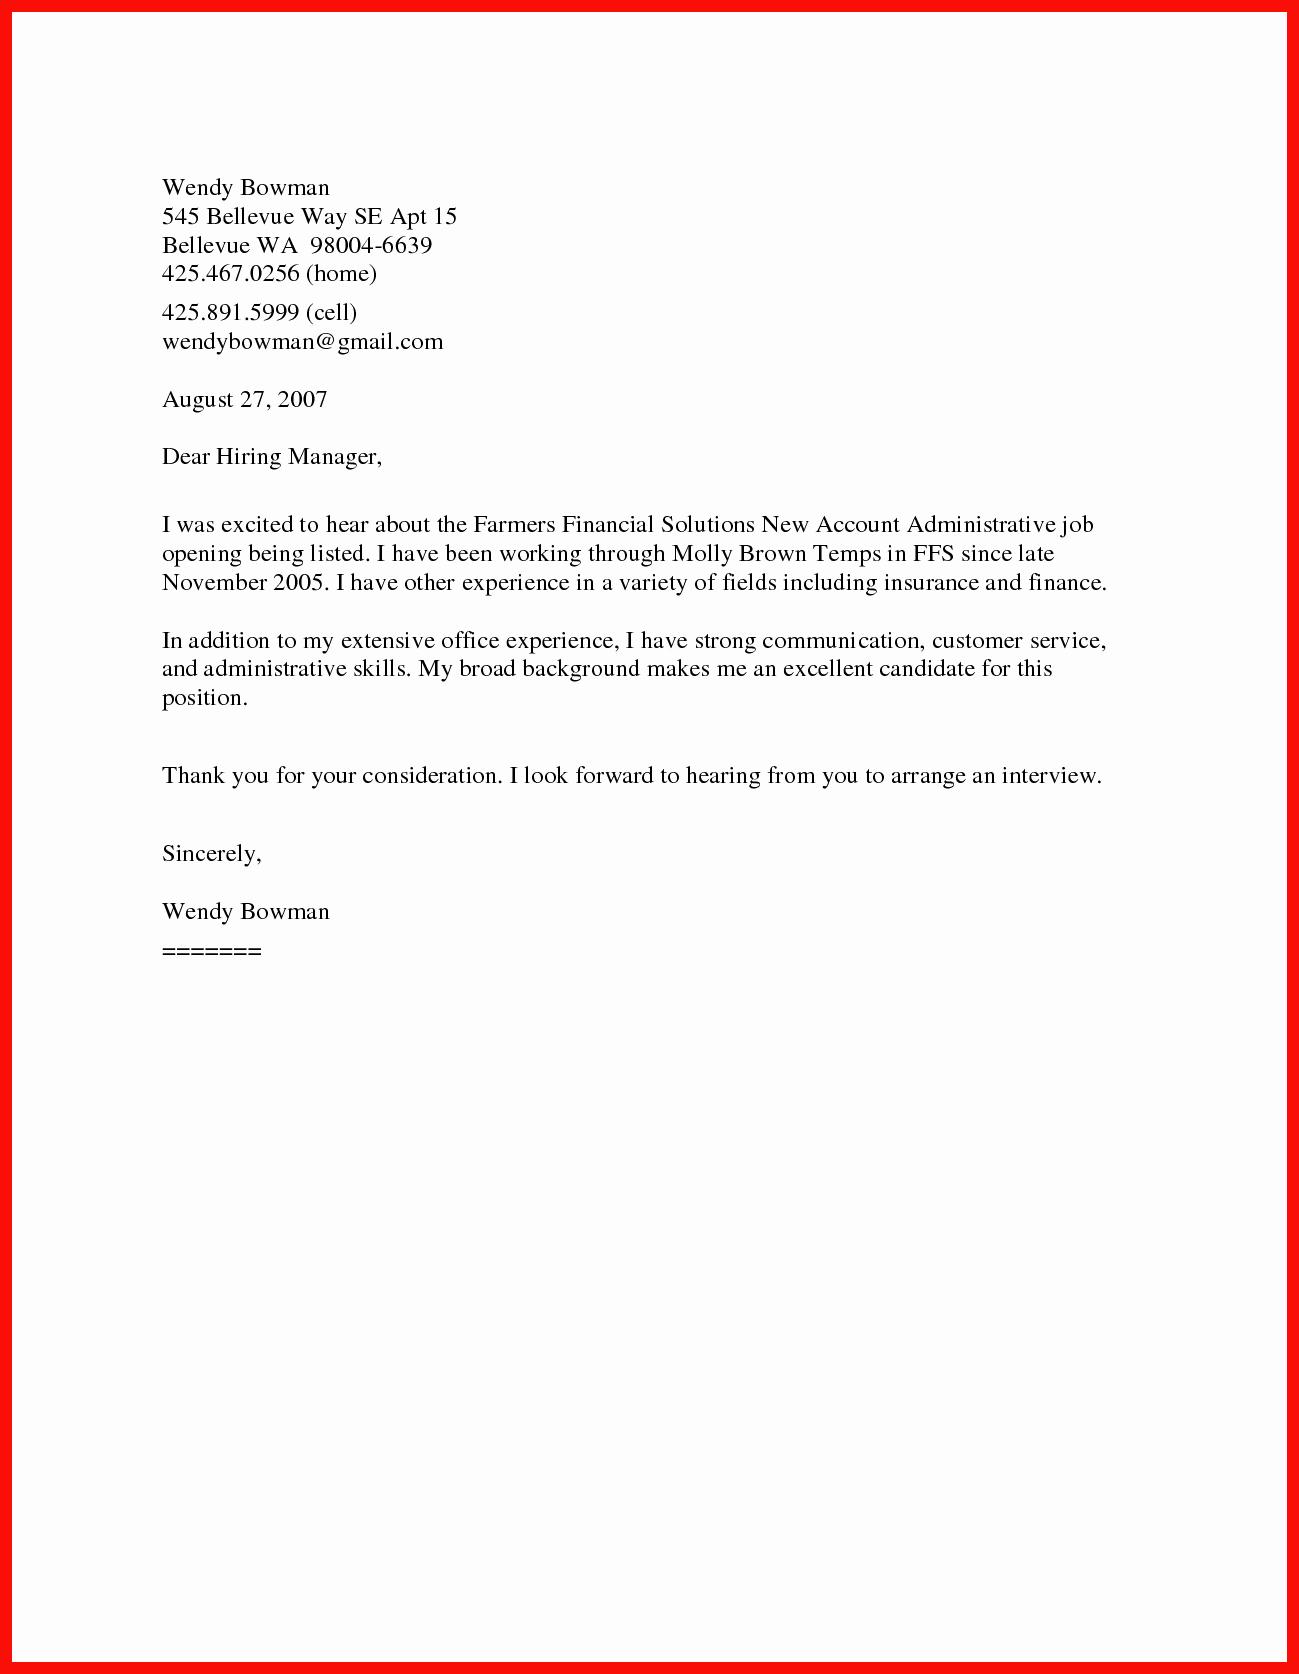 Resume and Cover Letter formats Elegant Short Cover Letter Sample